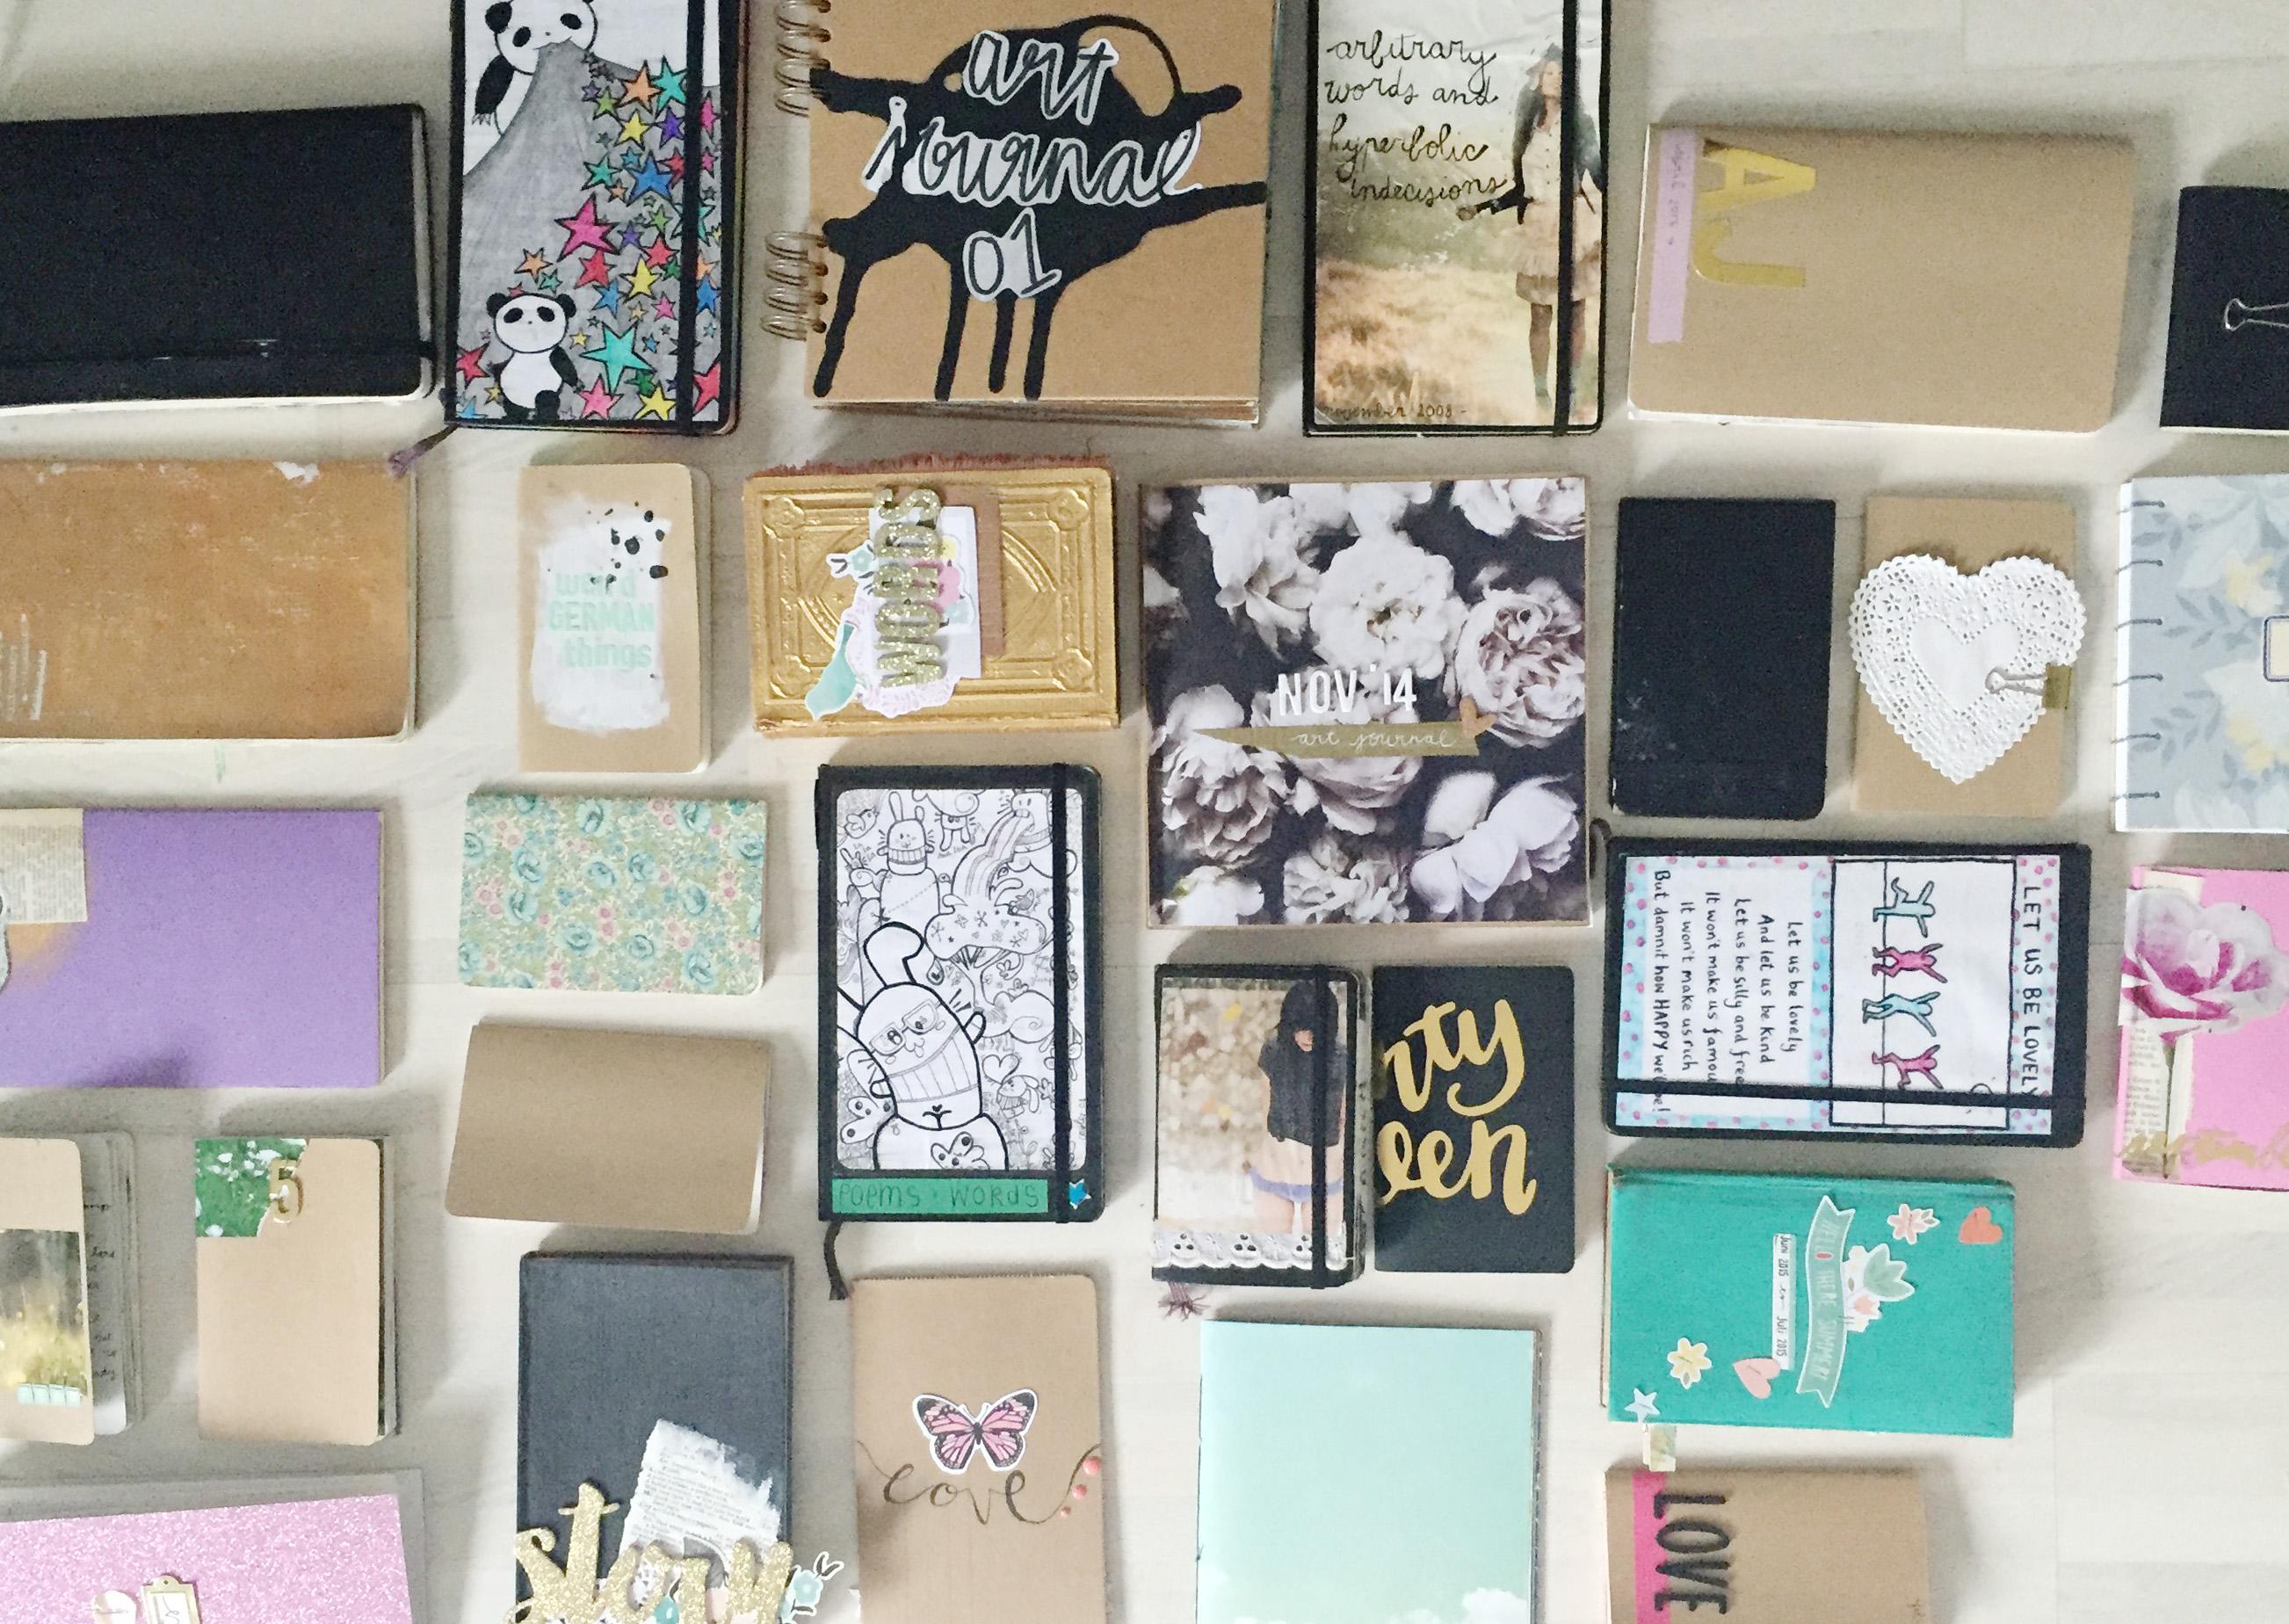 cayleegrey-pipsticks-journals